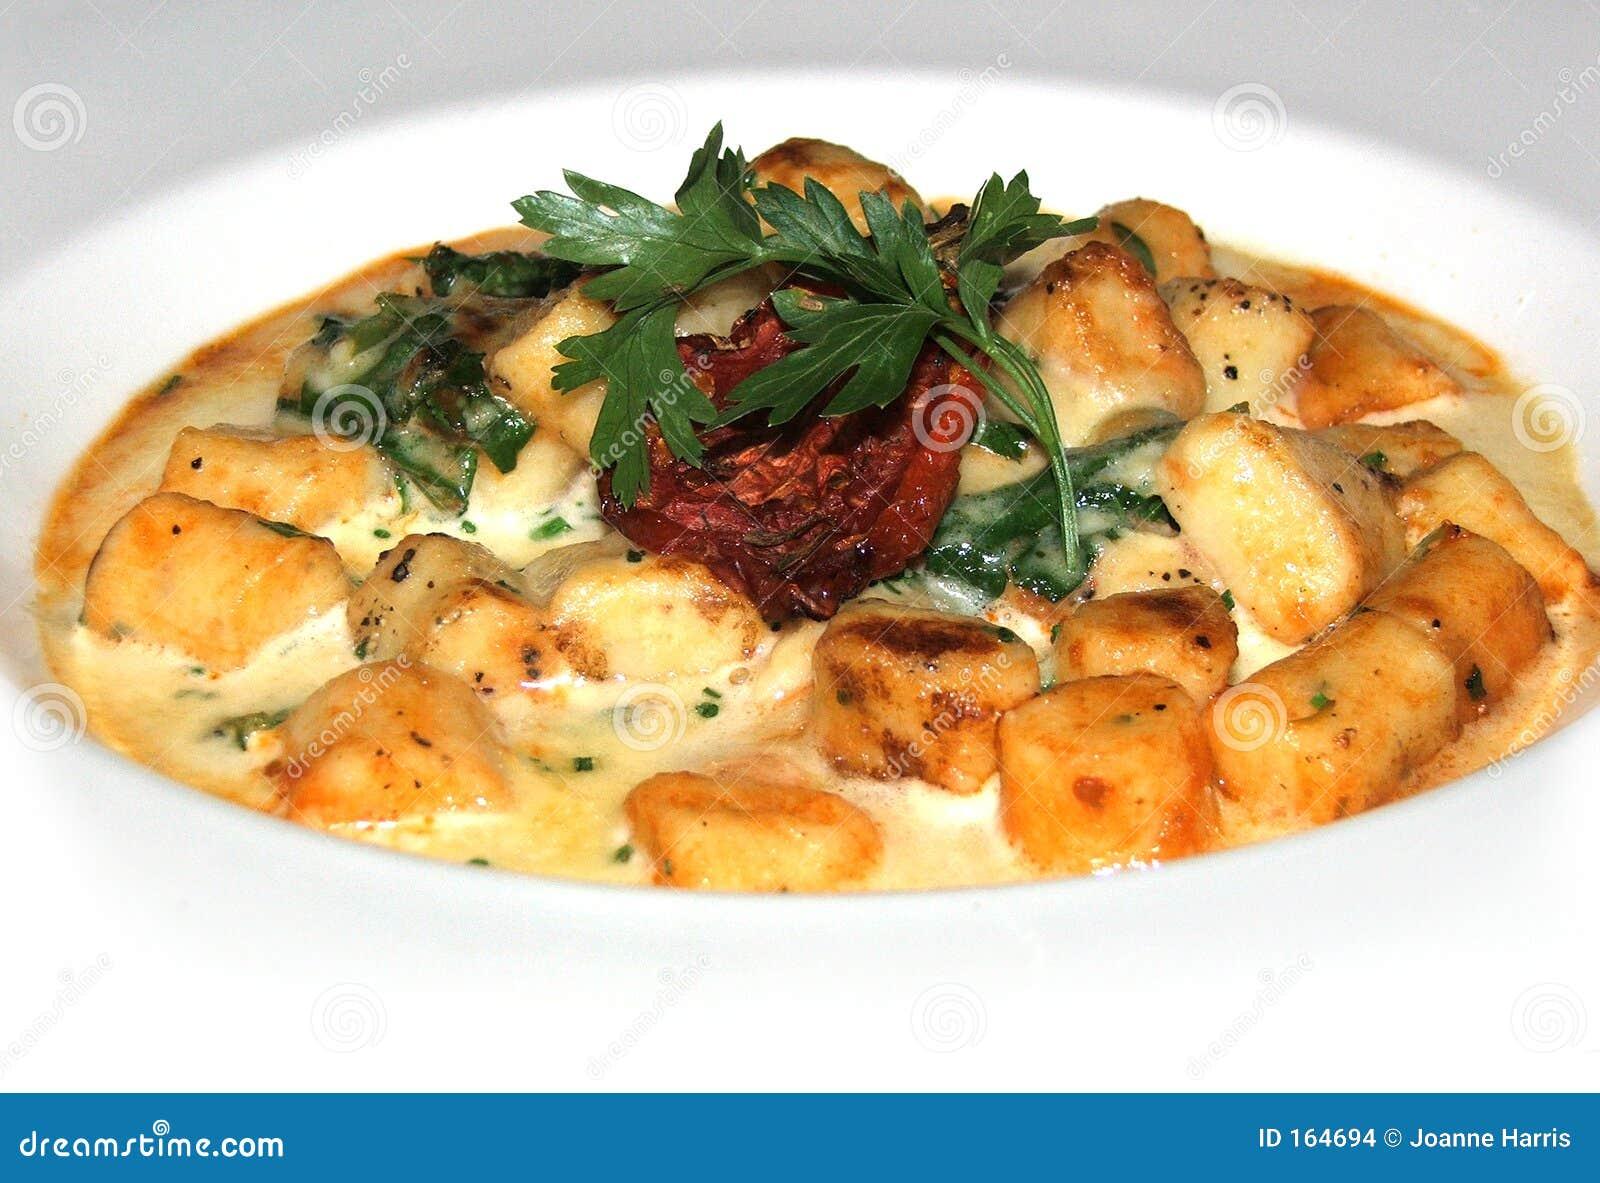 Gnocchi dish